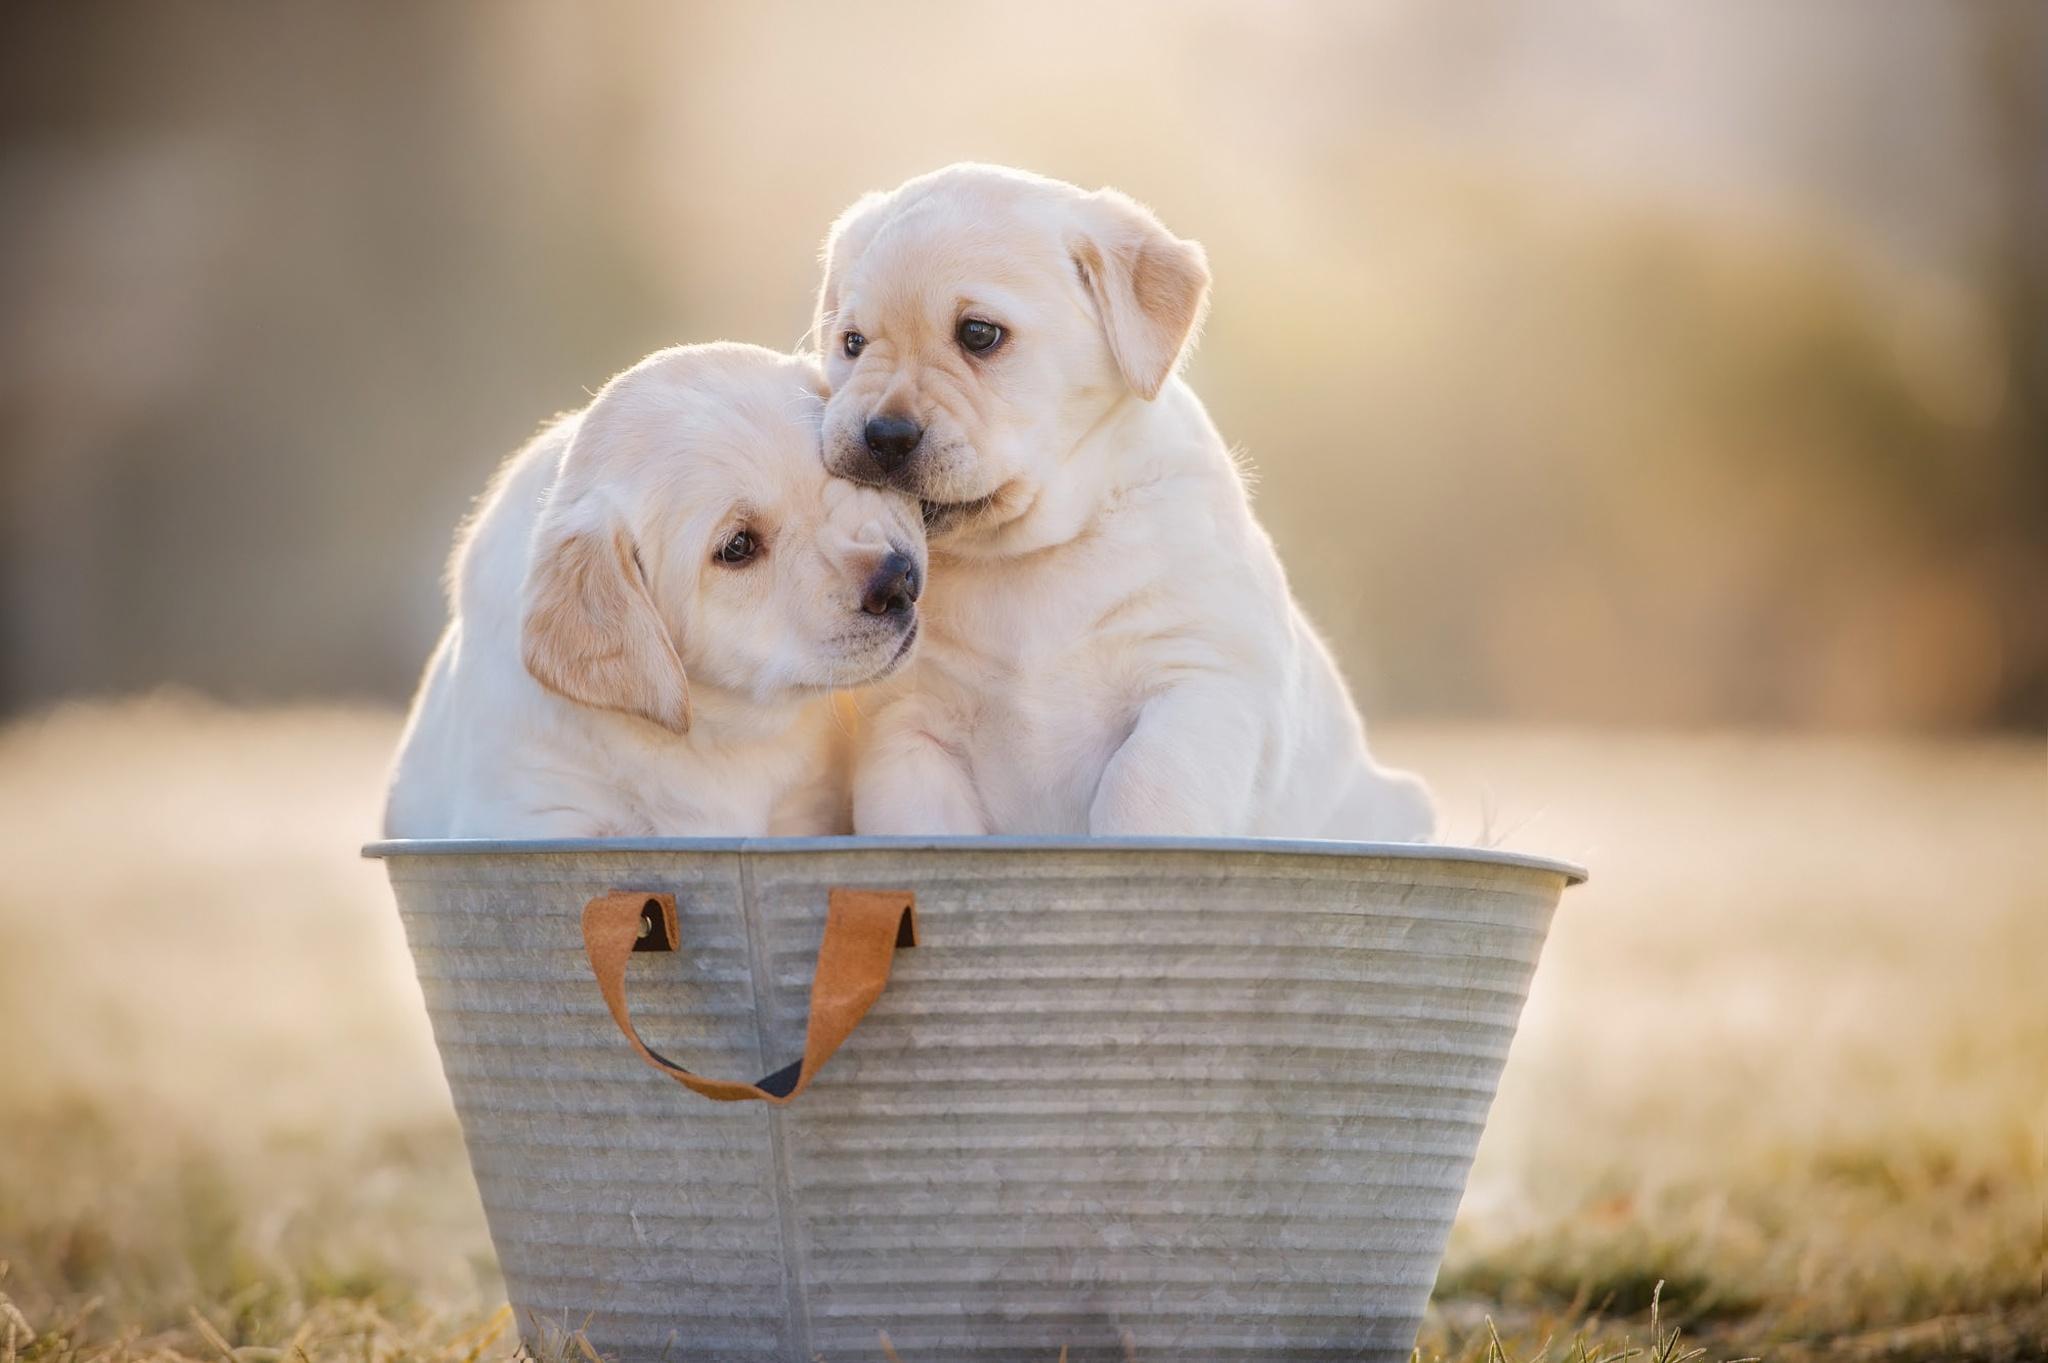 Dog Puppy Pet Baby Animal 2048x1363